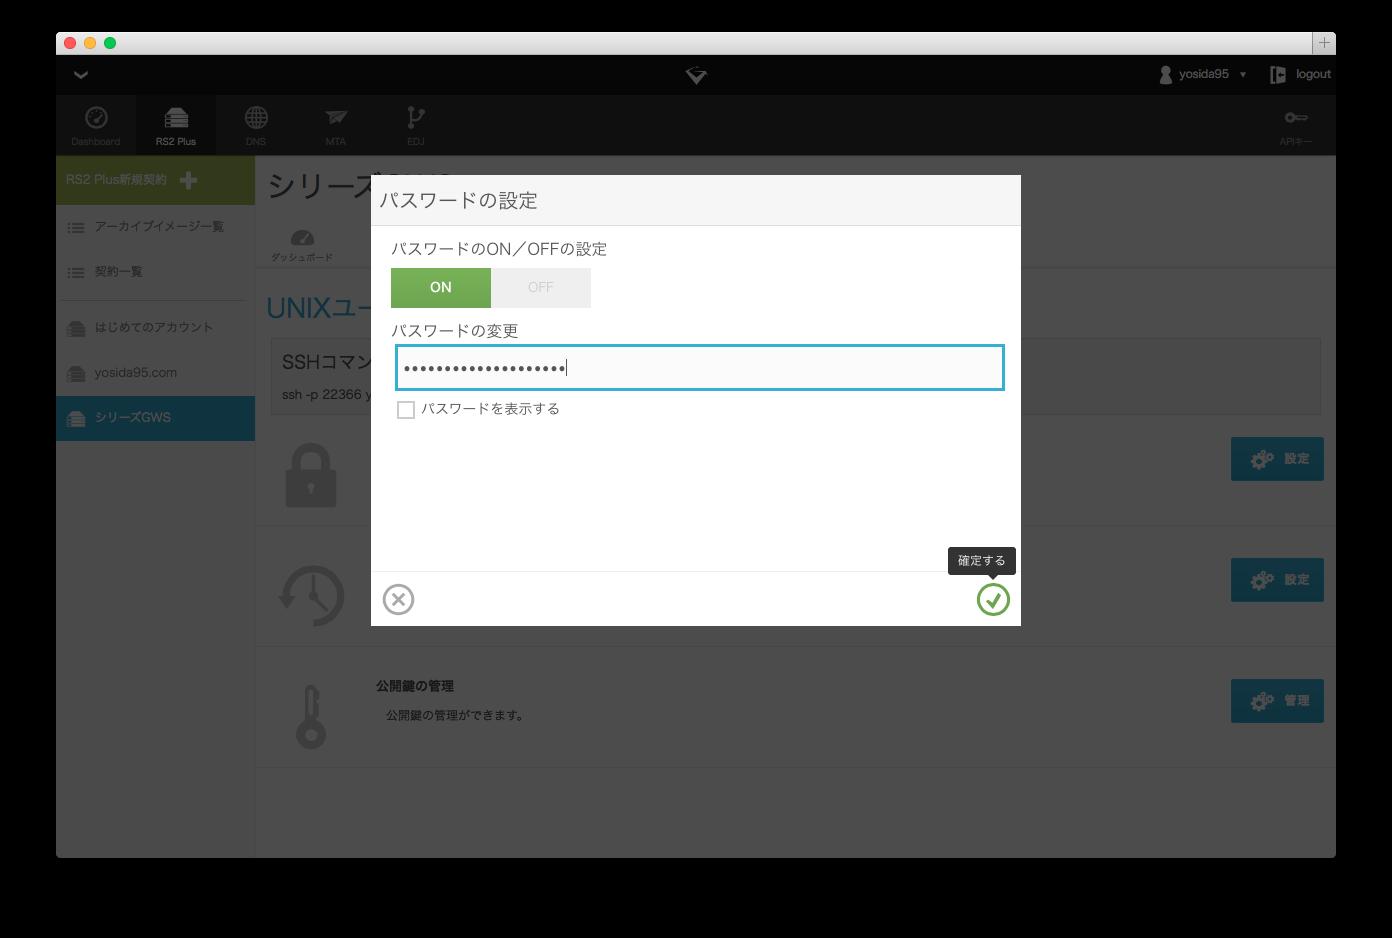 Gehirn RS2 Plus UNIX ユーザパスワード設定